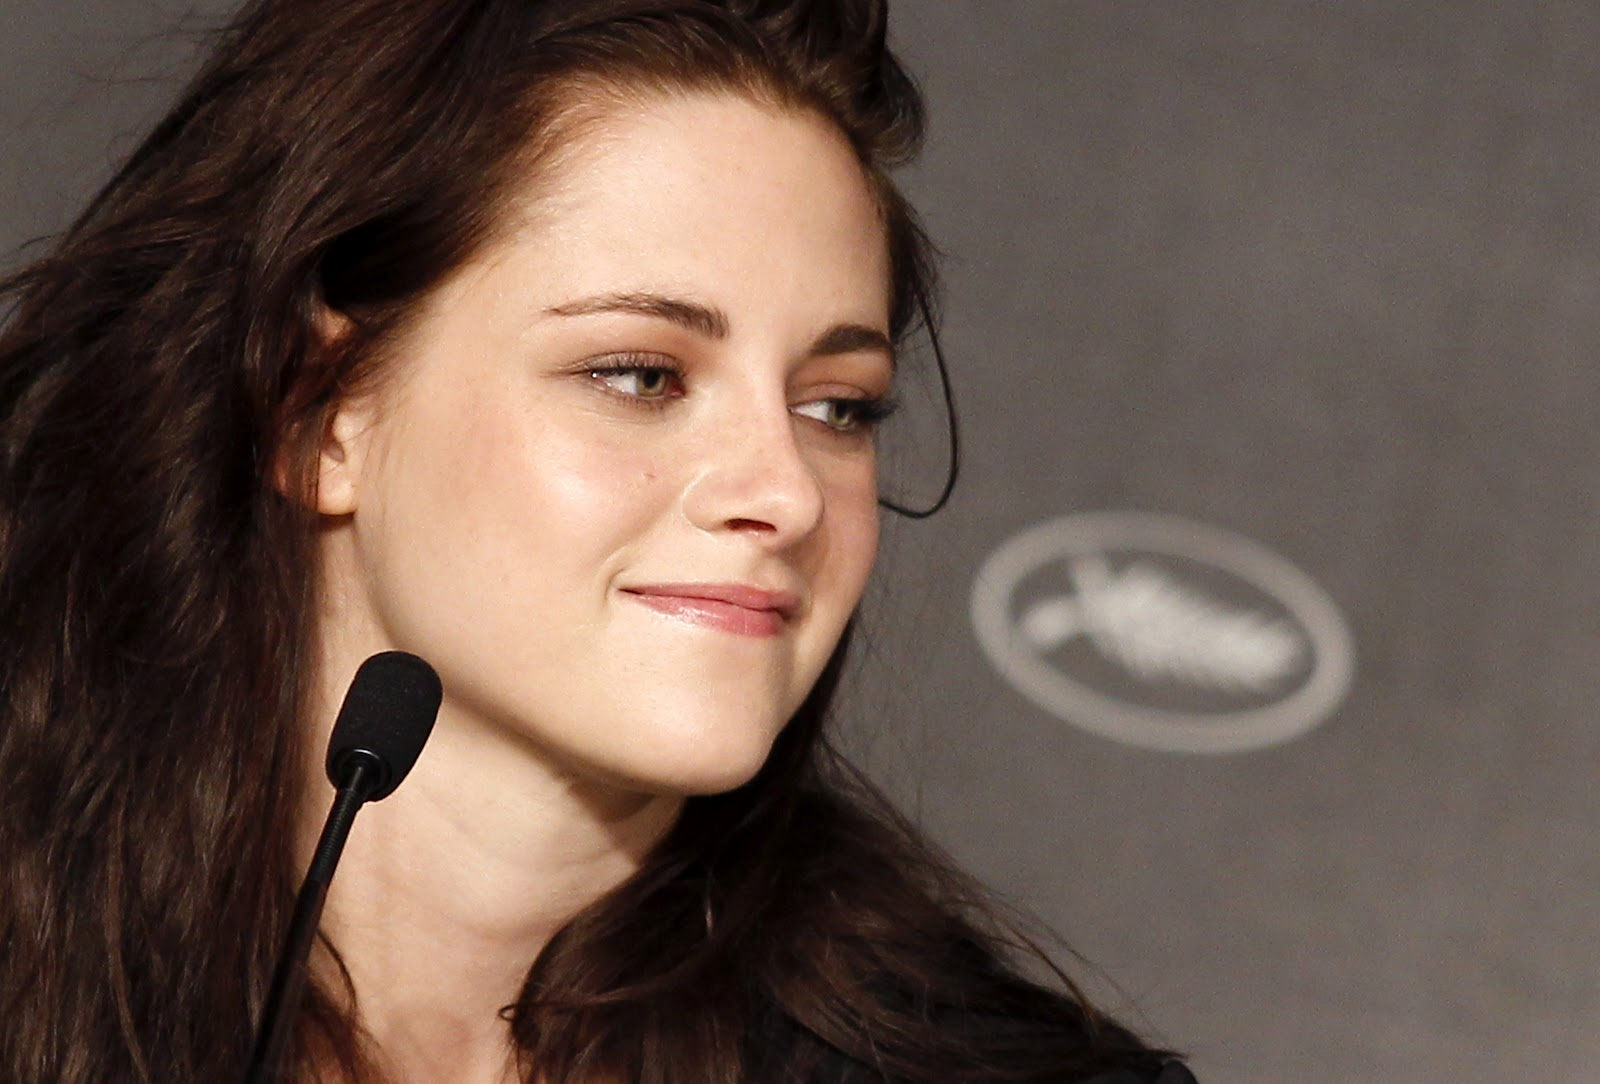 http://3.bp.blogspot.com/--LLsZ8N0Nww/T706zz7789I/AAAAAAAACTs/L_7yecBb3ic/s1600/Kstewartfans+Cannes+PC++%25285%2529.jpg